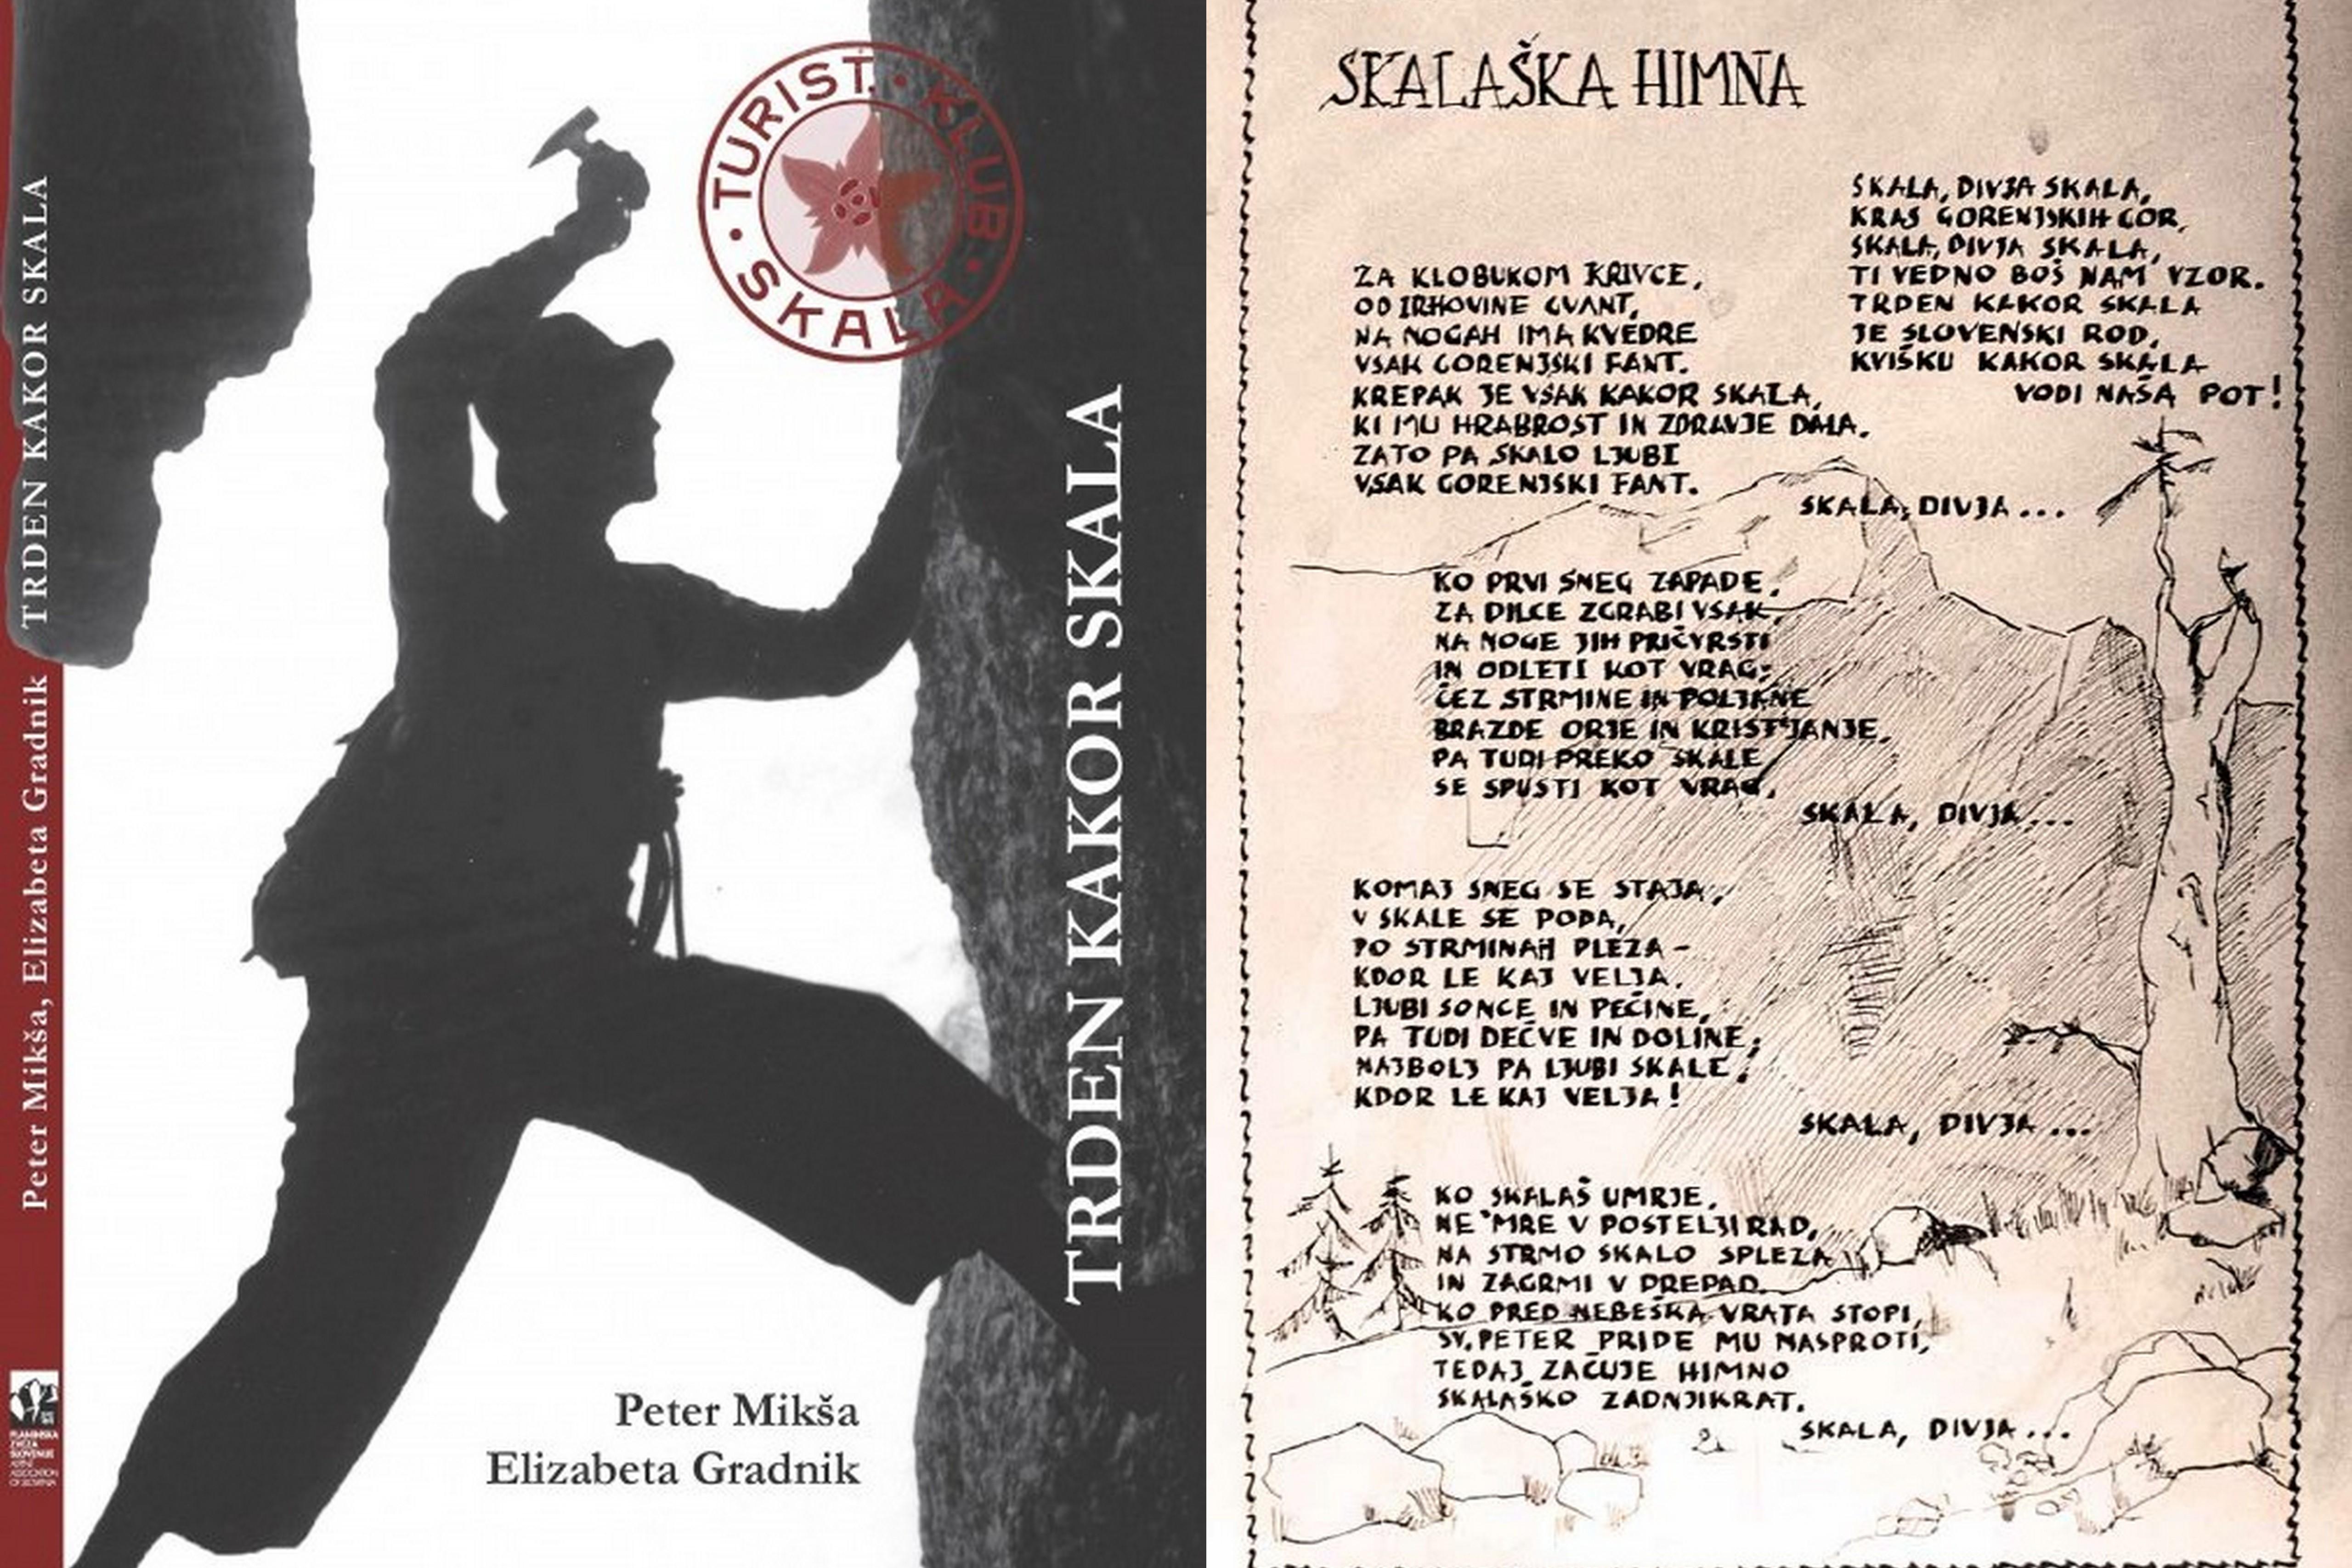 trden_kakor_skala_skalaska_himna